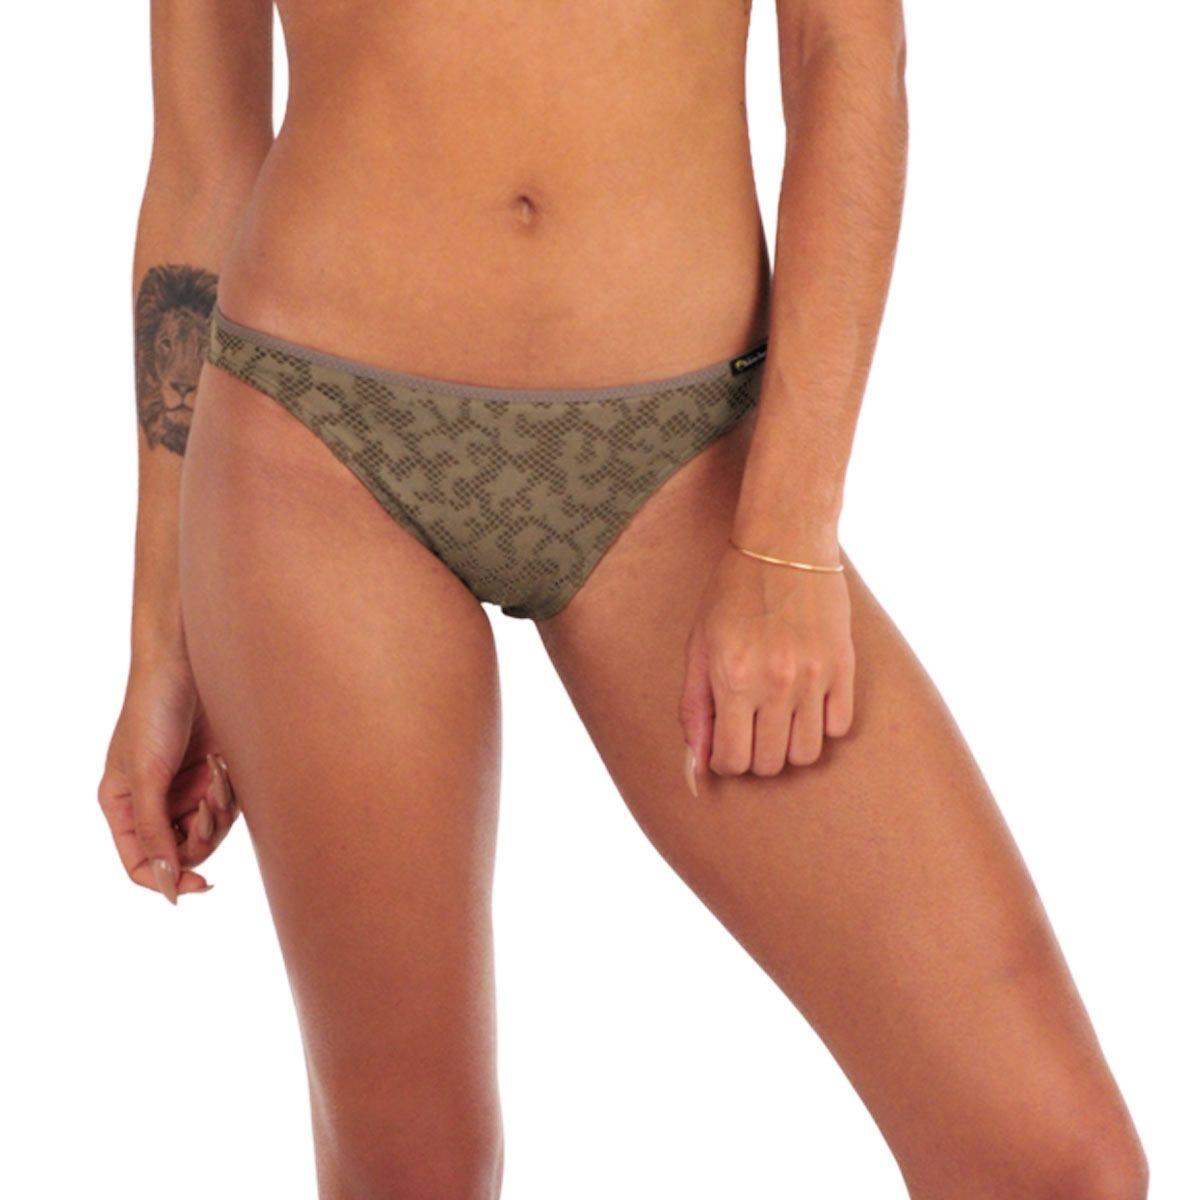 Maillot de bain culotte kaki effet crochet Amaia (Bas)